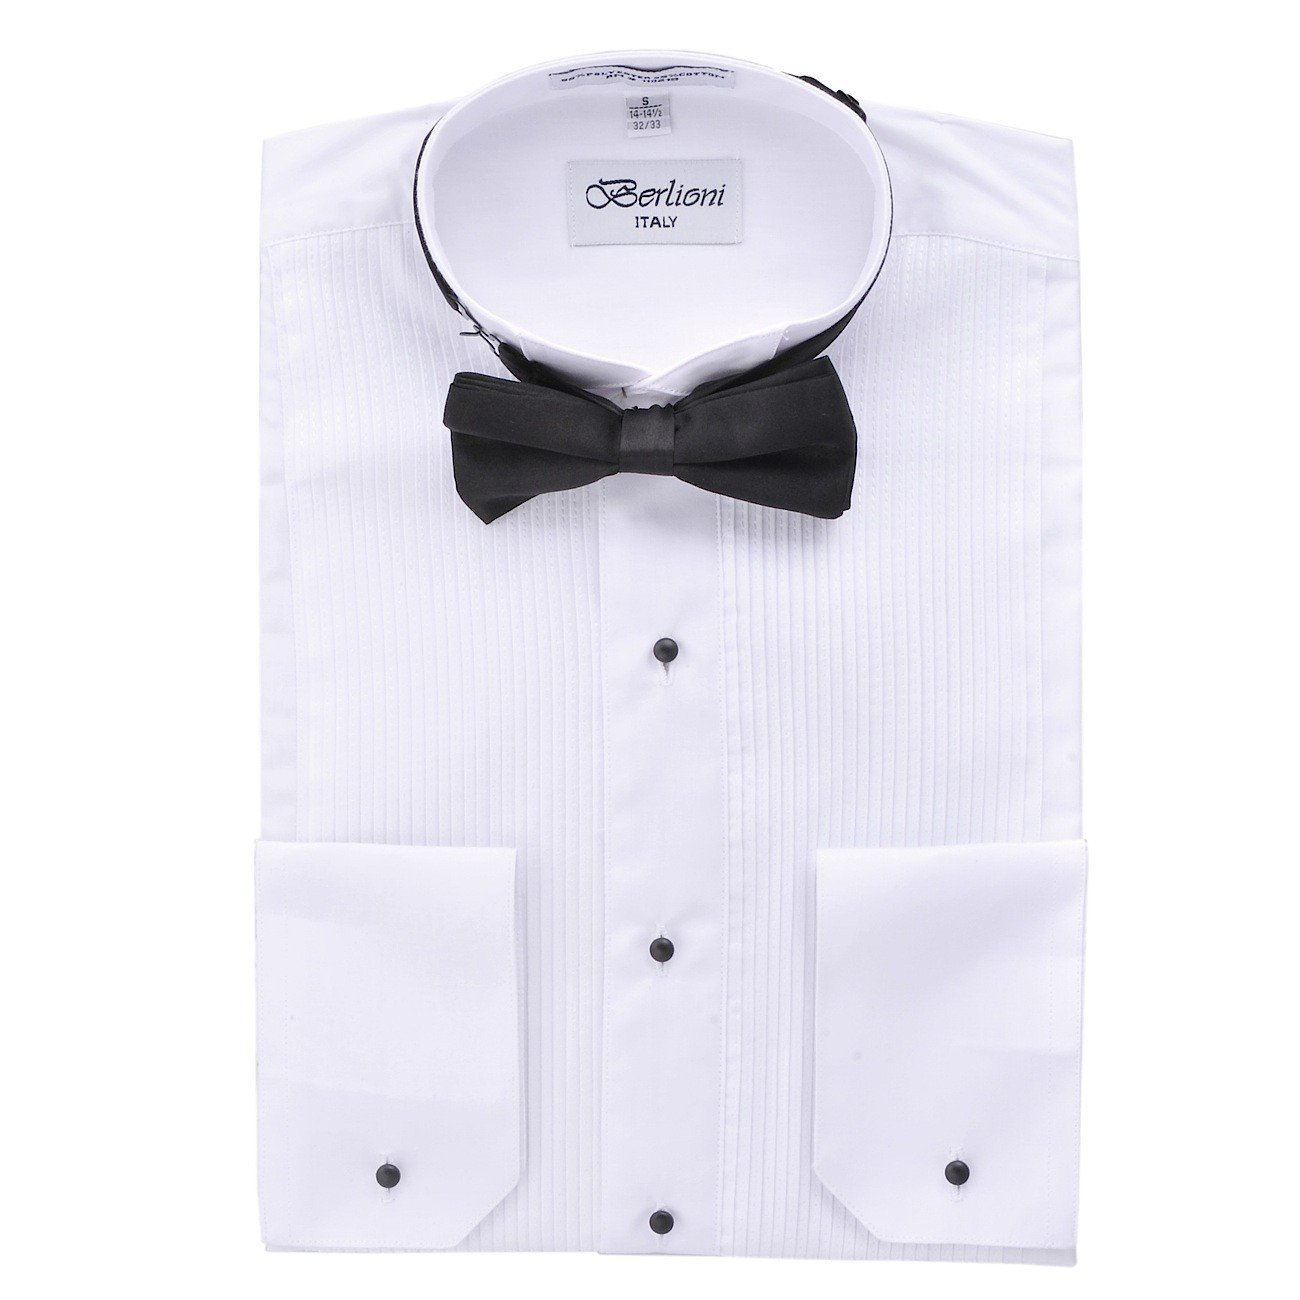 Elegant Men's Cufflink Convertible White Tuxedo Dress Shirt + Black Bowtie (Medium – 15/15.5 Neck; 32/33 Sleeves) by King Formal Wear